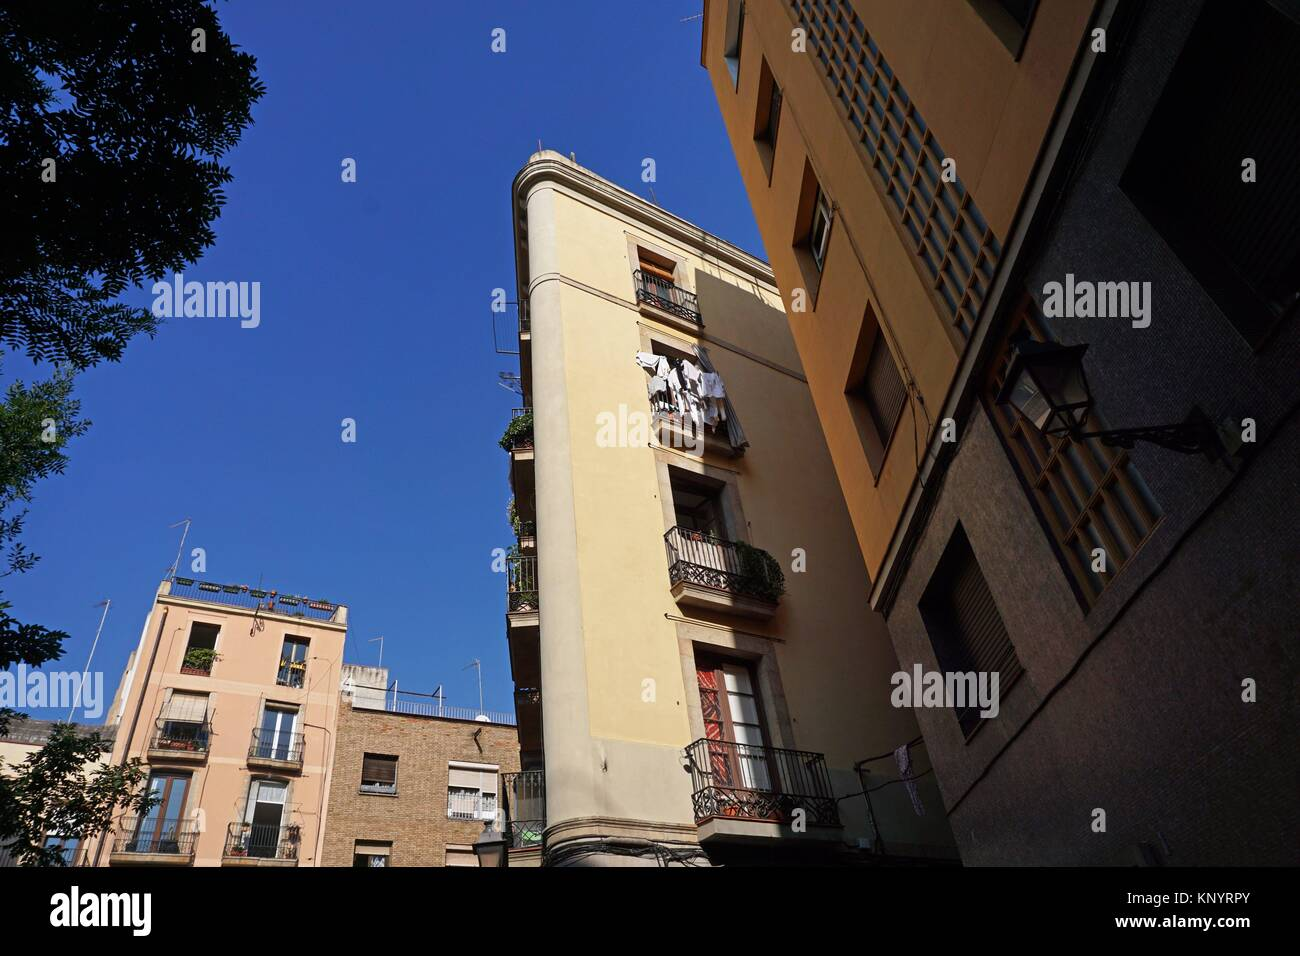 Ciutat Vella buildings. Barcelona, Catalonia, Spain, Europe. - Stock Image